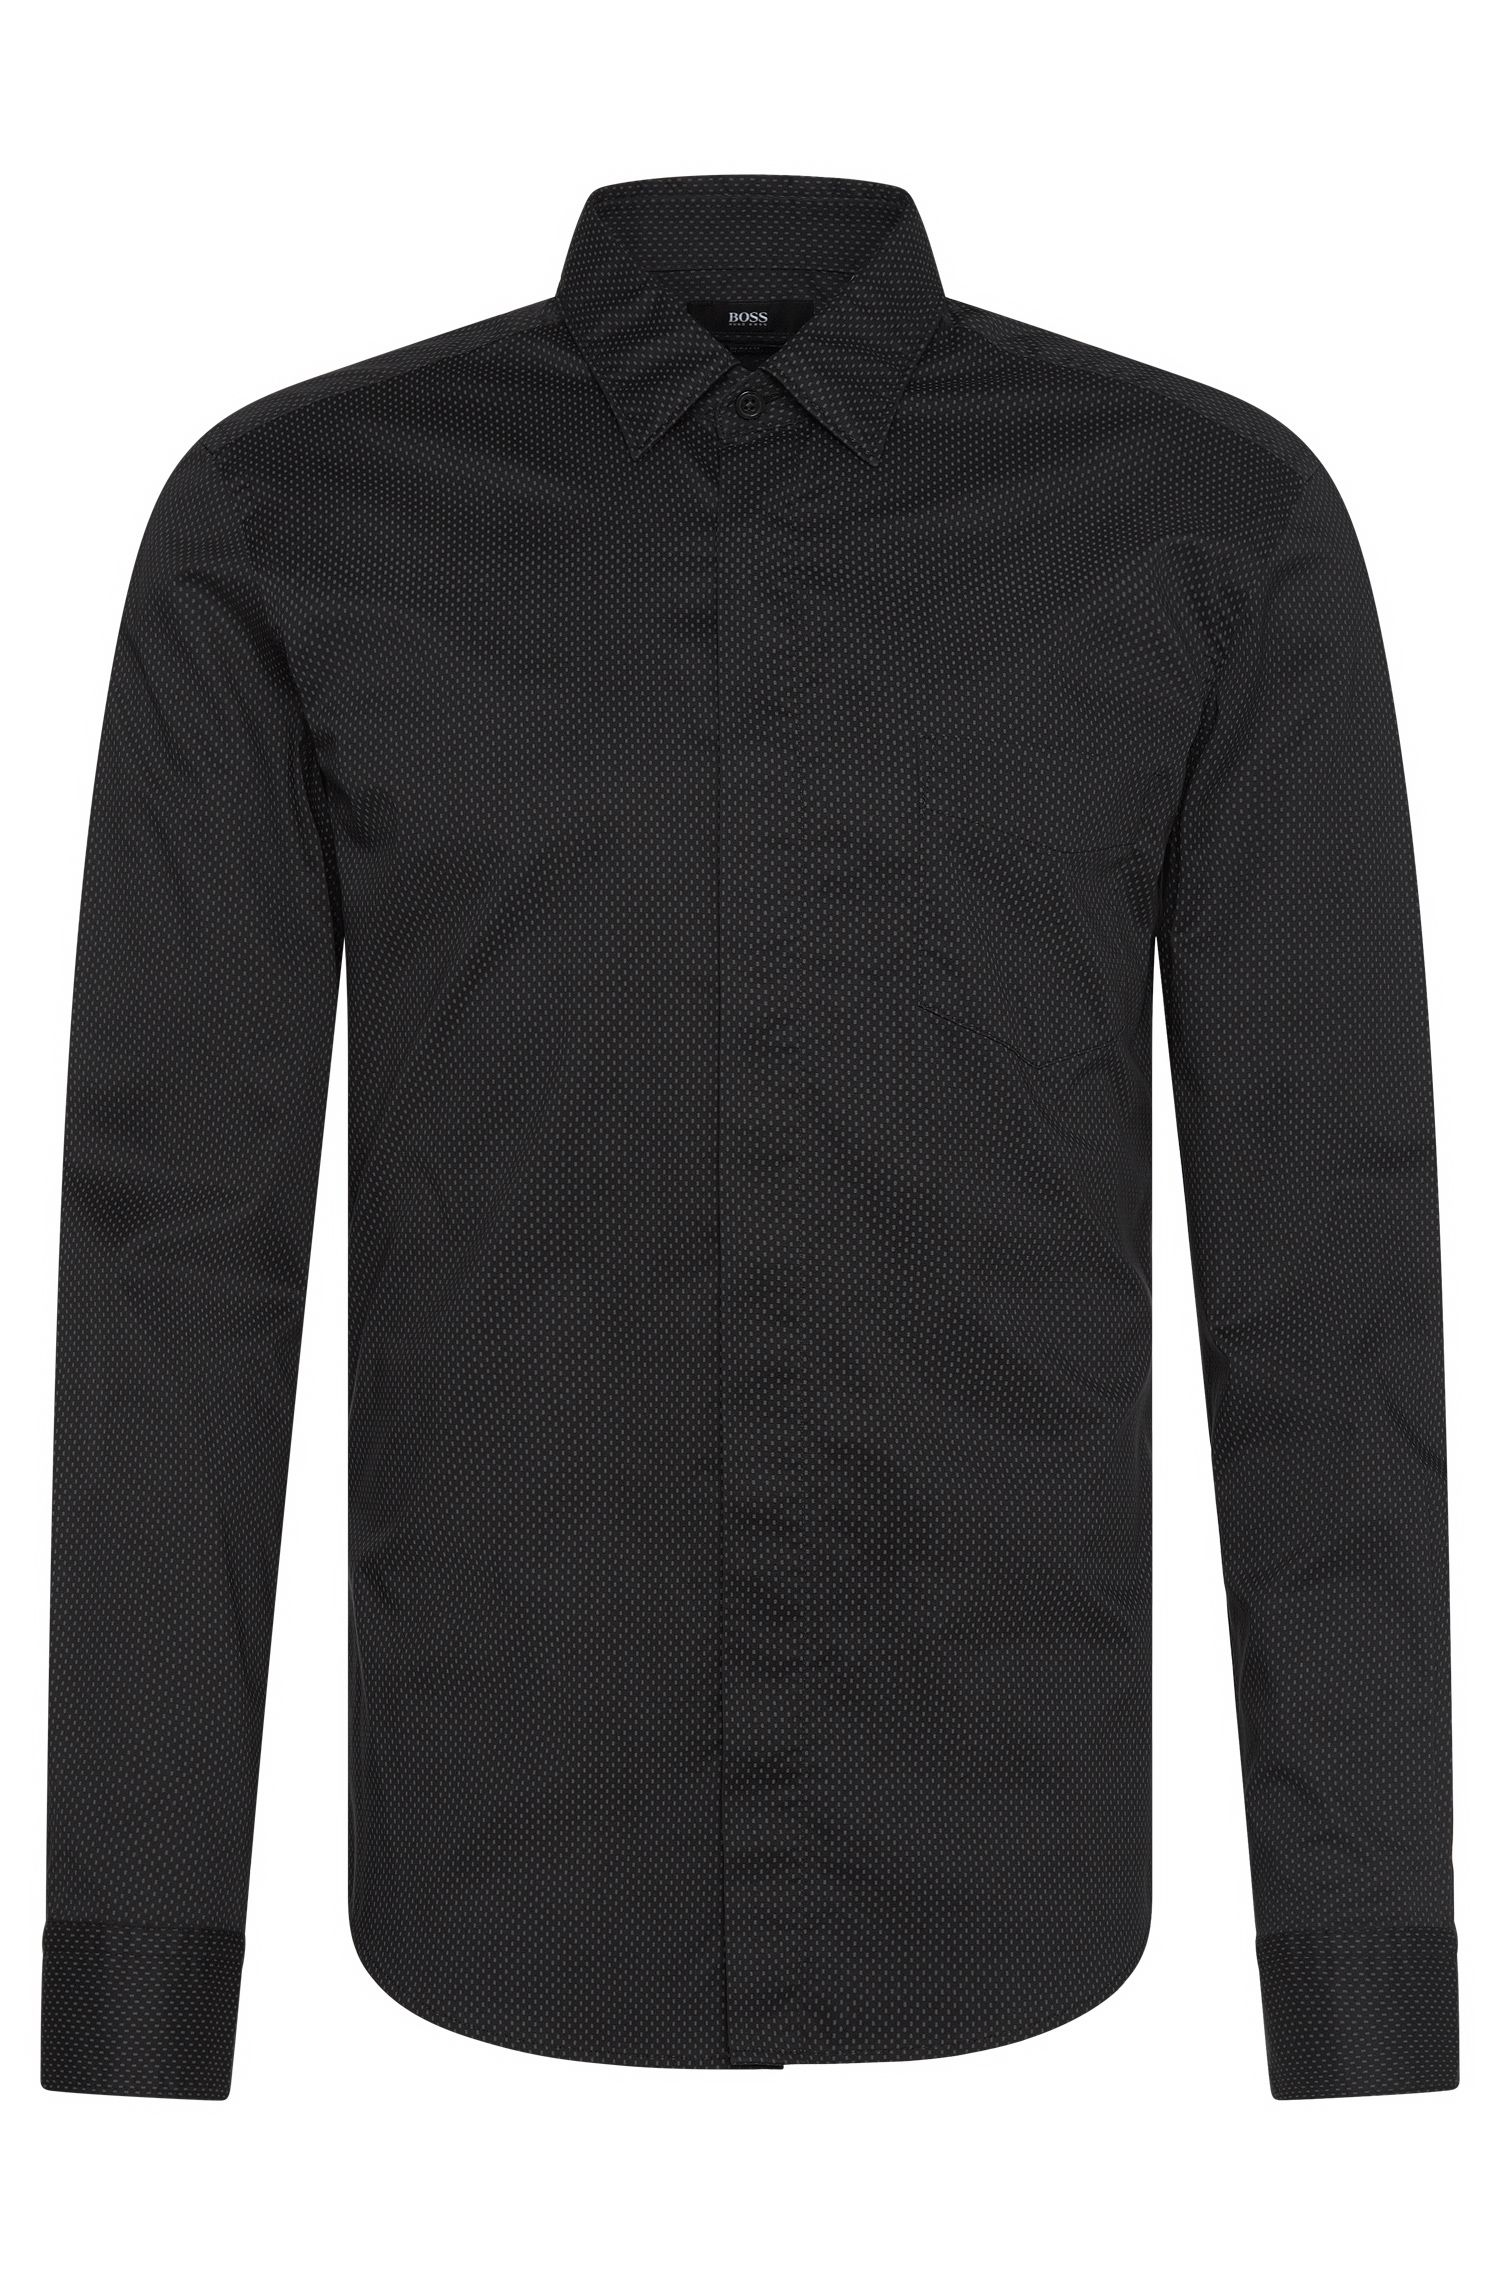 'Reid' | Slim Fit, Stretch cotton Patterned Button Down Shirt